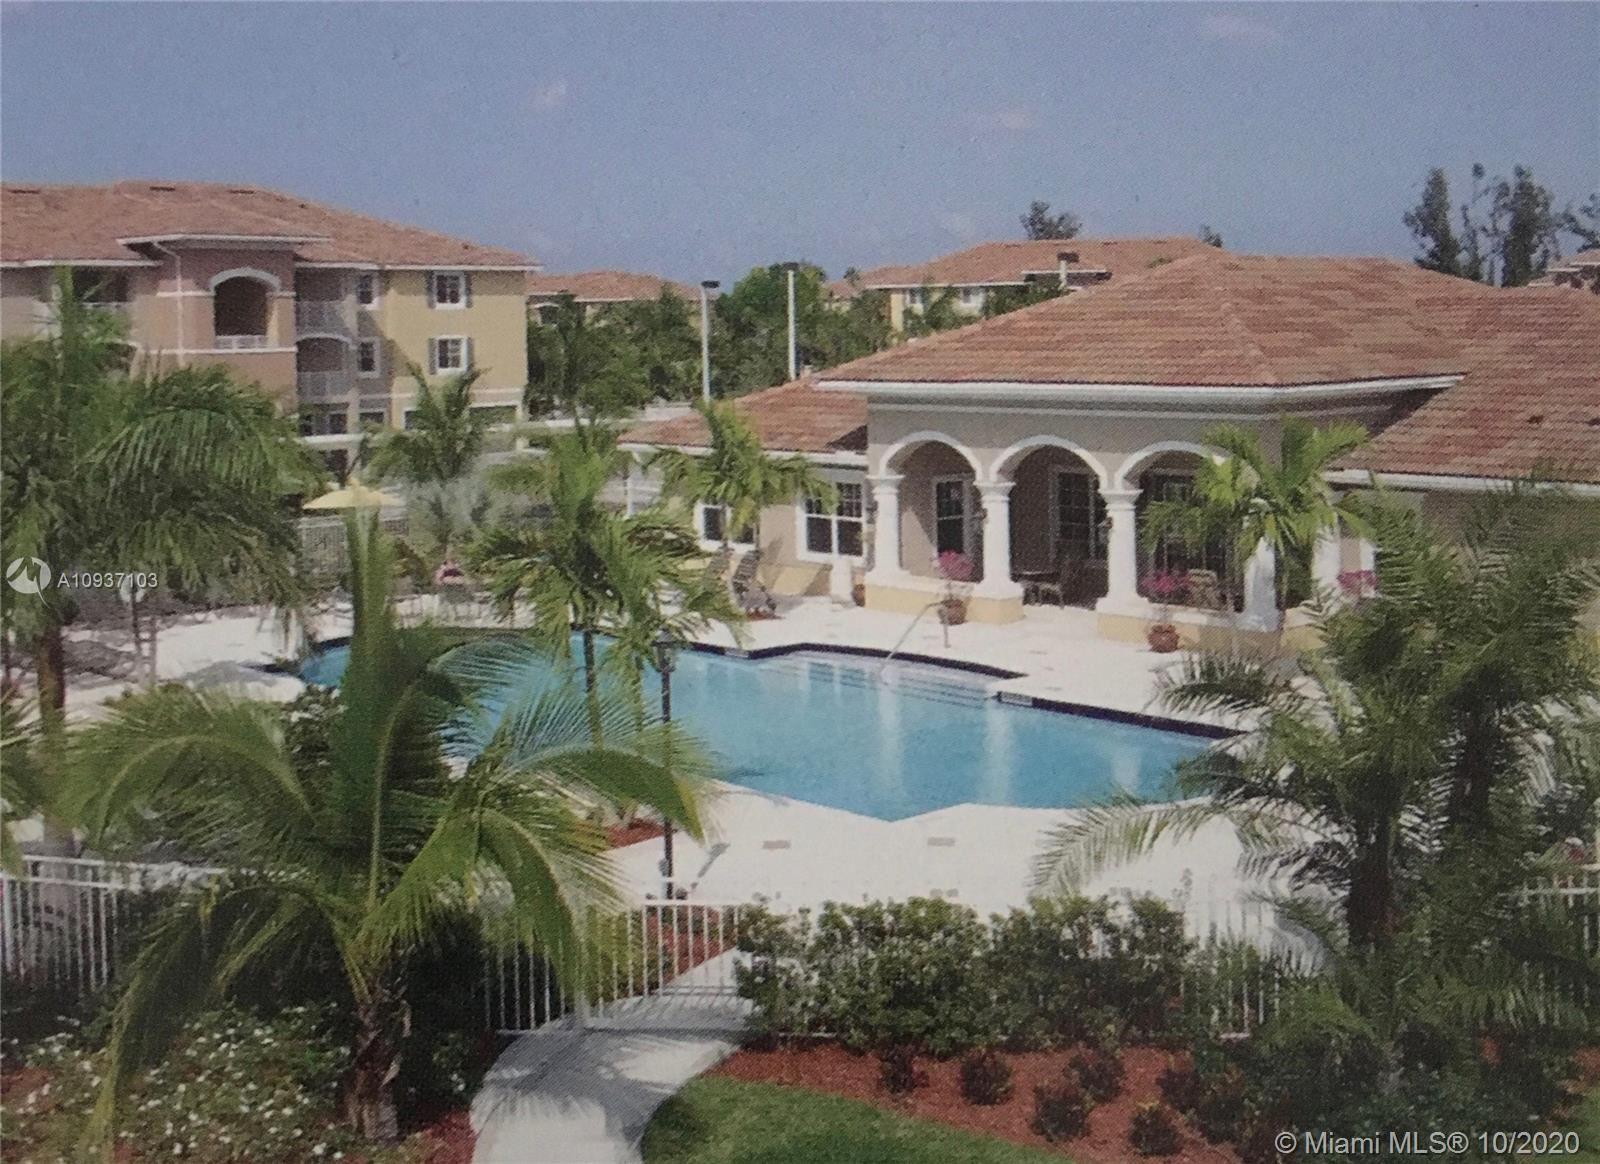 6466 Emerald Dunes Dr #208, West Palm Beach, FL 33411 - #: A10937103